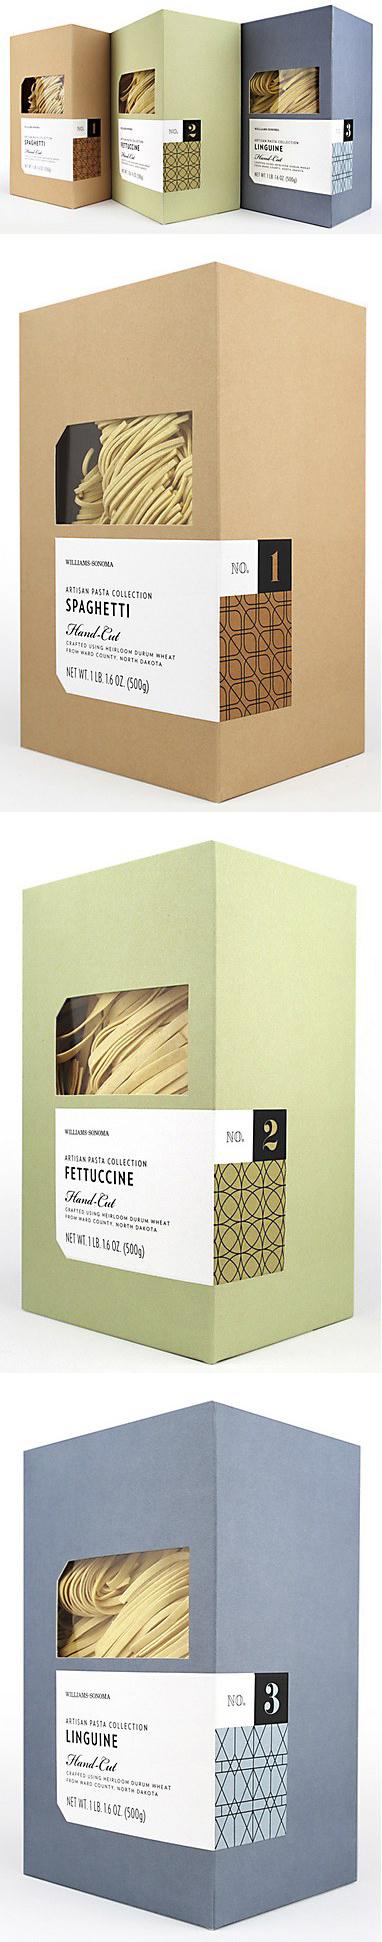 williams sonoma in-house design | artisan pasta packaging